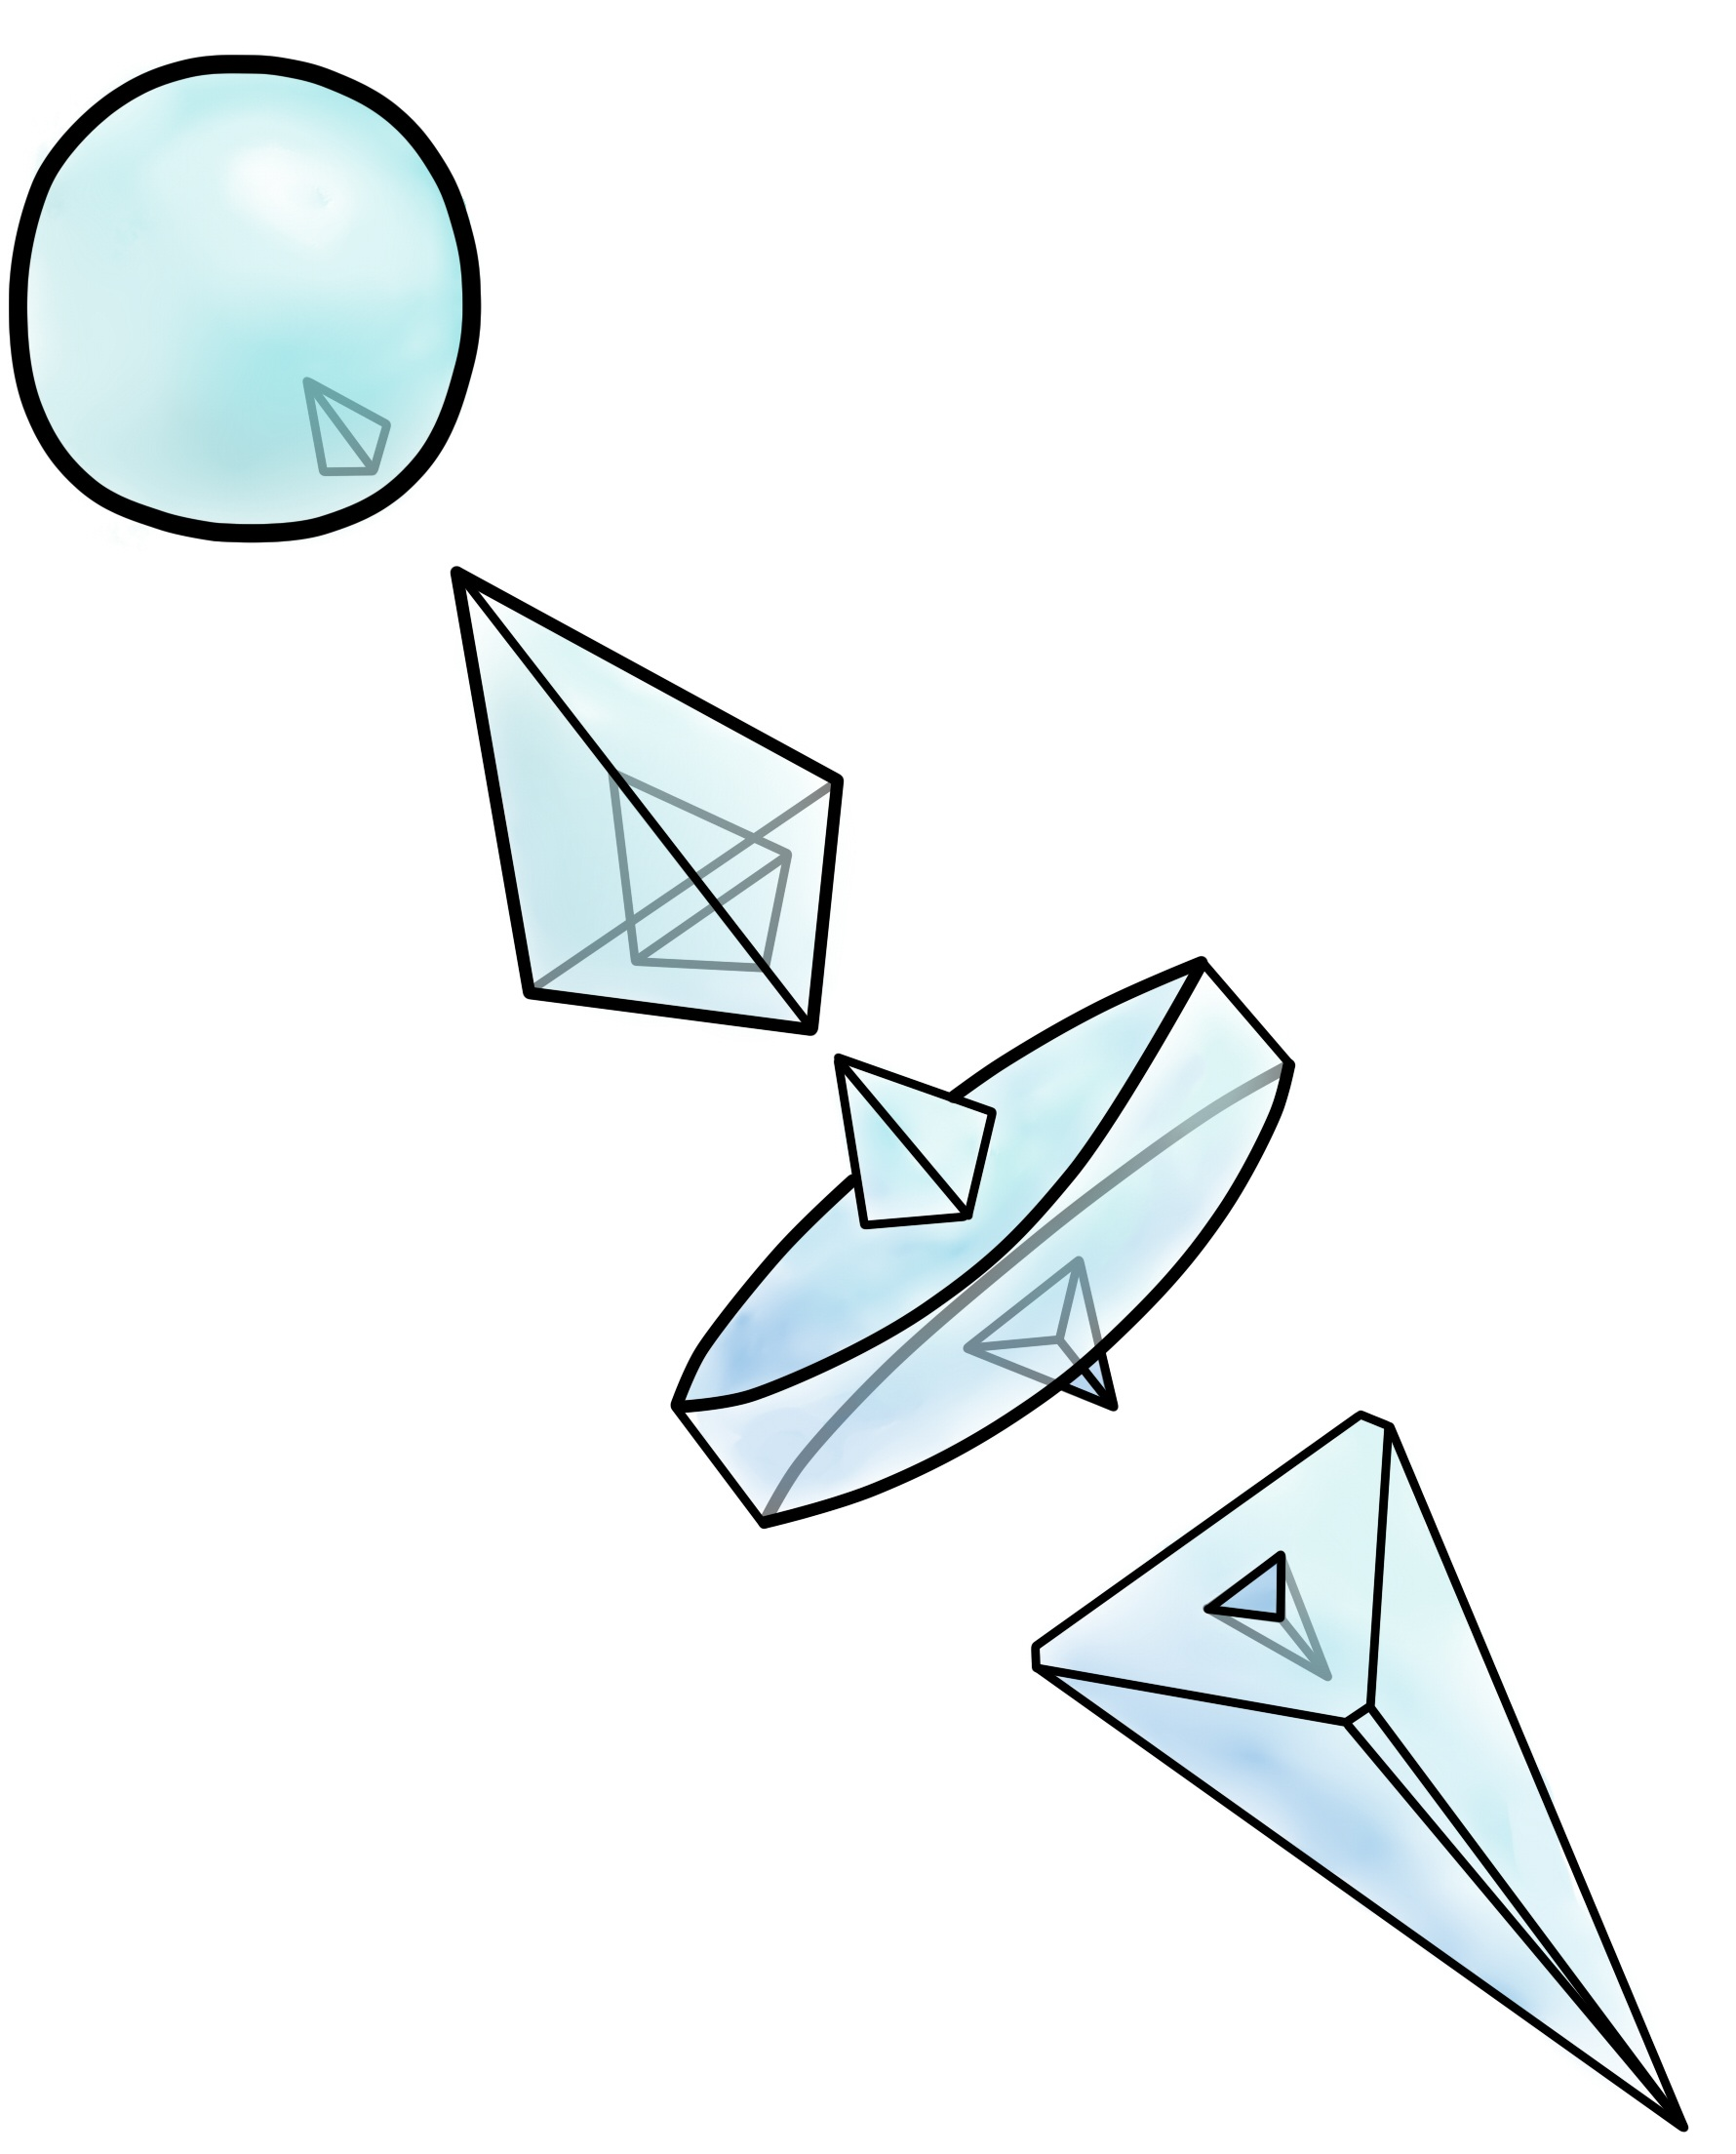 Crystal shard from Negima Neo